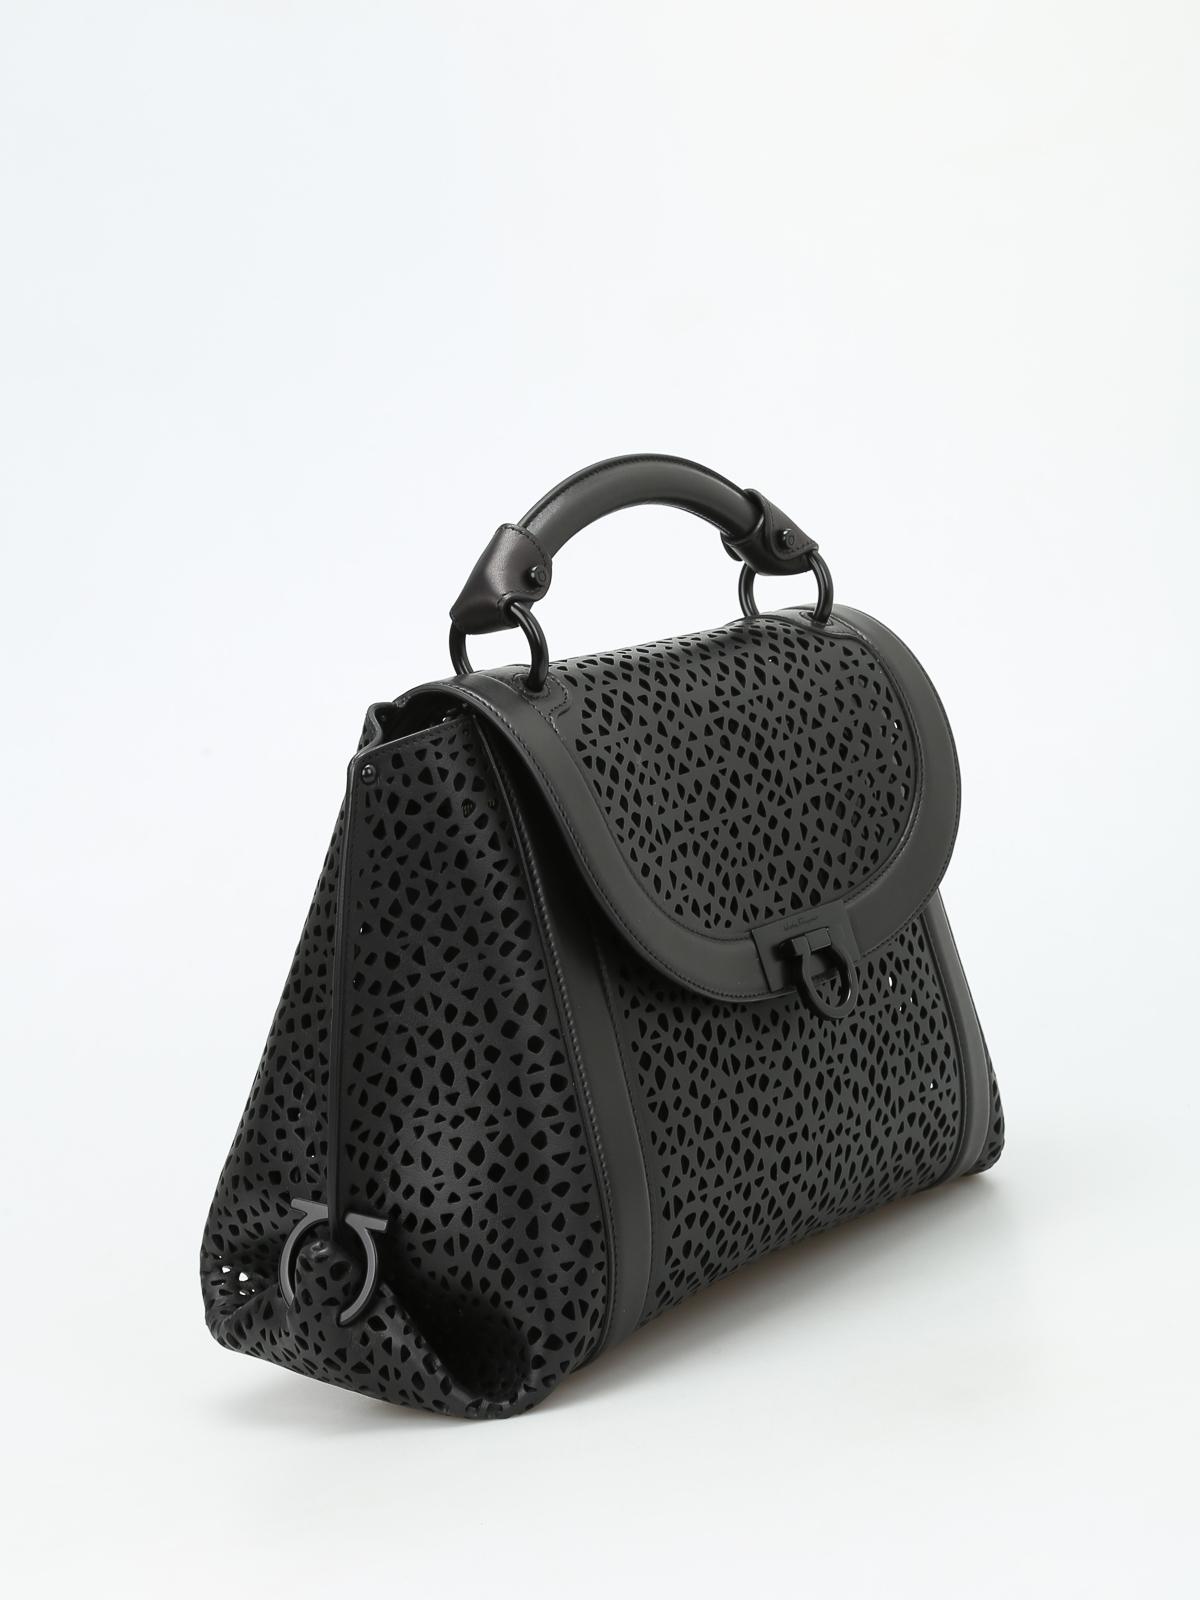 8ef1779db367 ... SALVATORE FERRAGAMO bowling bags online - Soft Sofia laser cut medium  handbag san francisco 4e74b 68561 ...